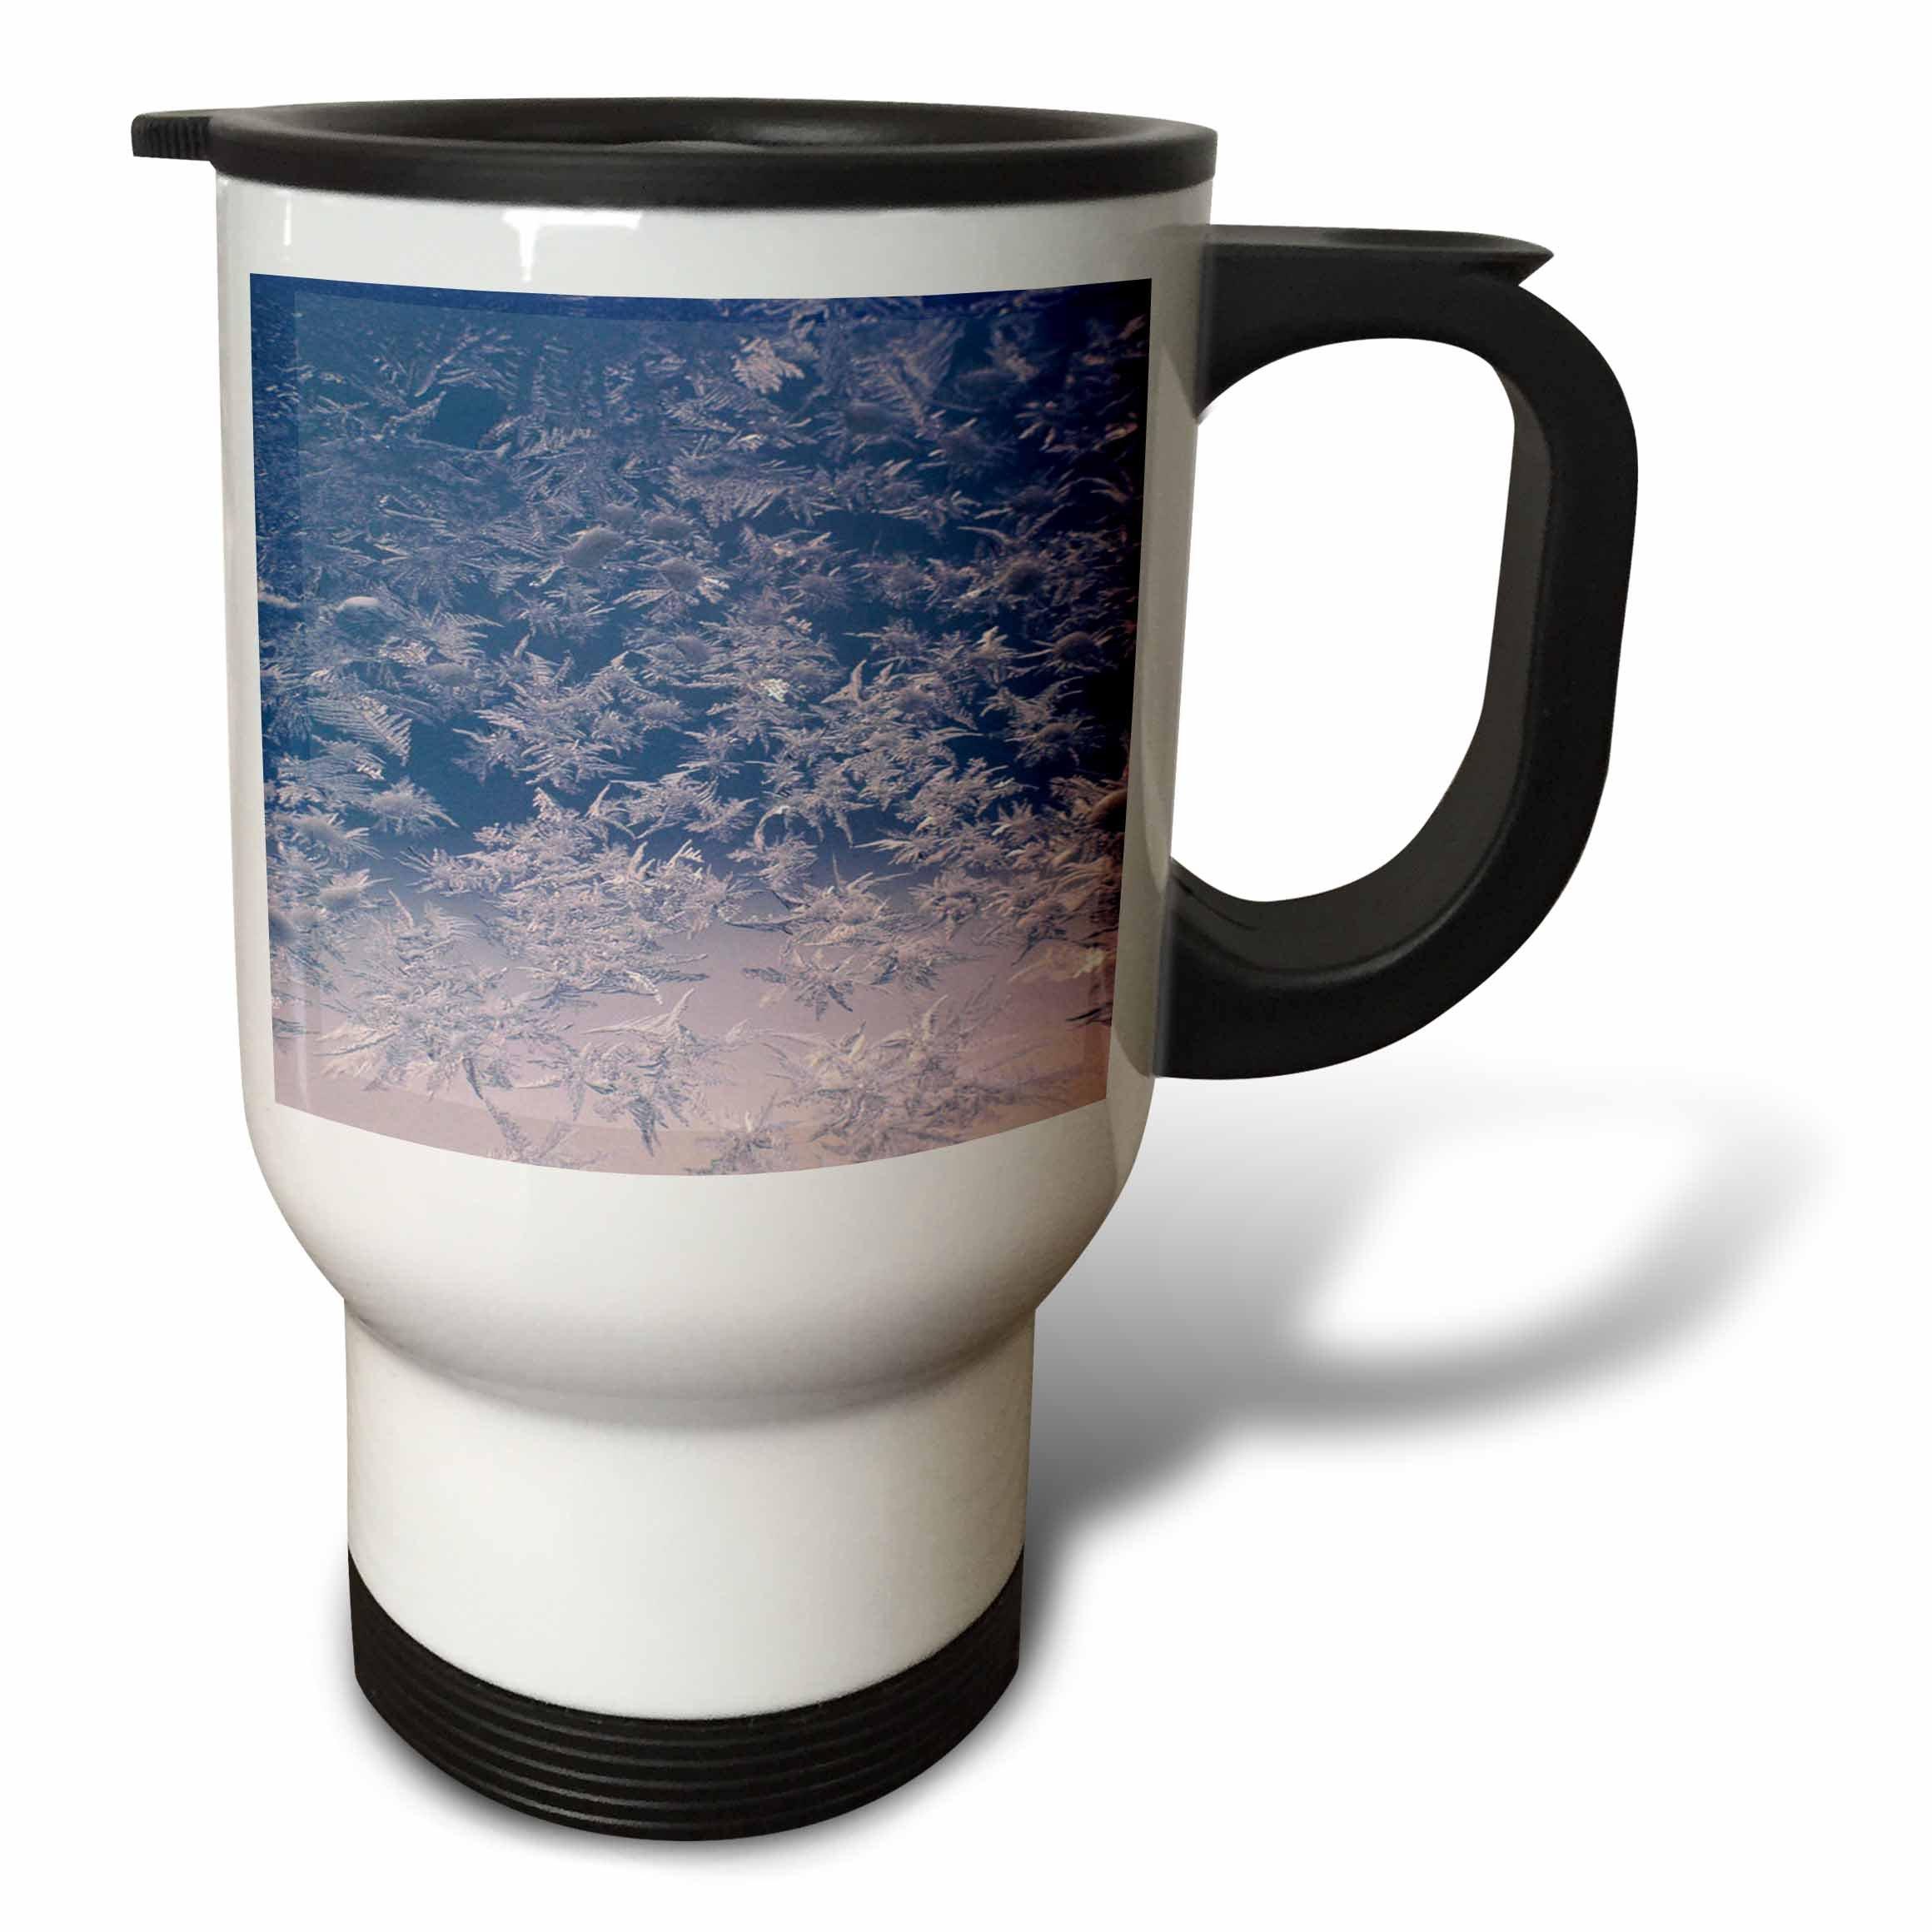 3dRose TDSwhite – Winter Seasonal Nature Photos - Window Snowflakes - 14oz Stainless Steel Travel Mug (tm_284946_1)